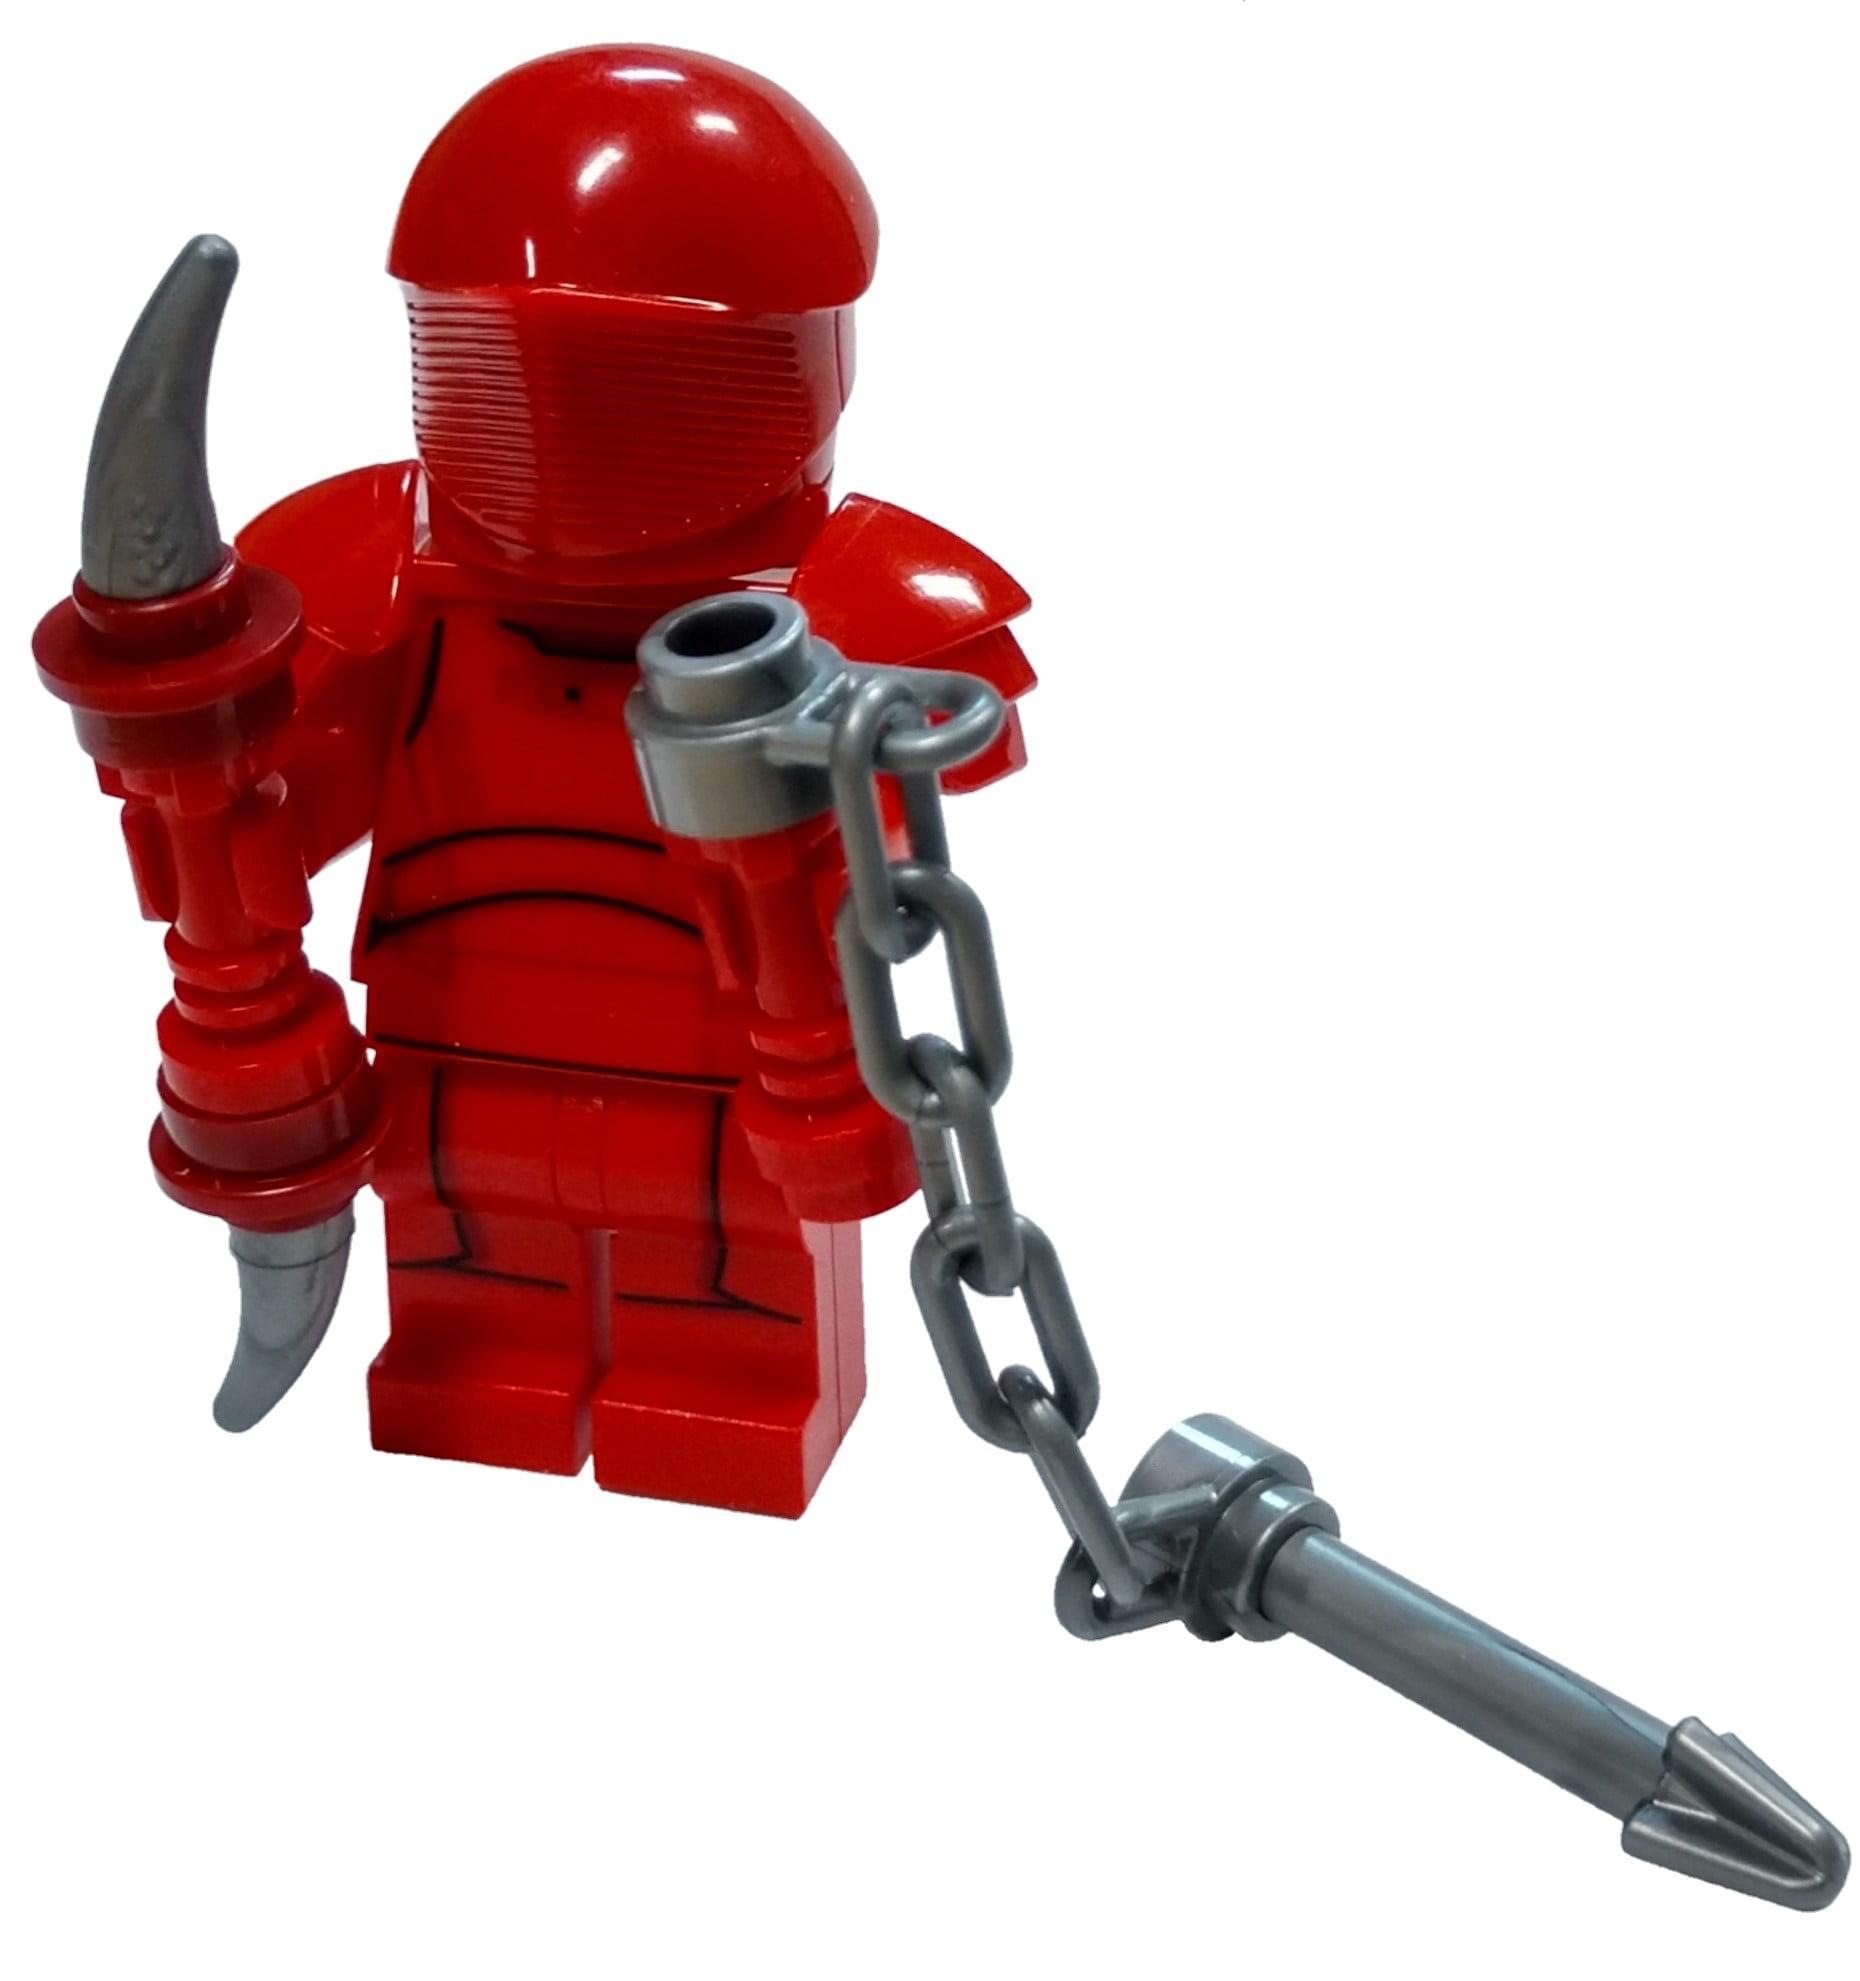 Flat Helmet LEGO  Elite Praetorian Guard Minifigure Star wars